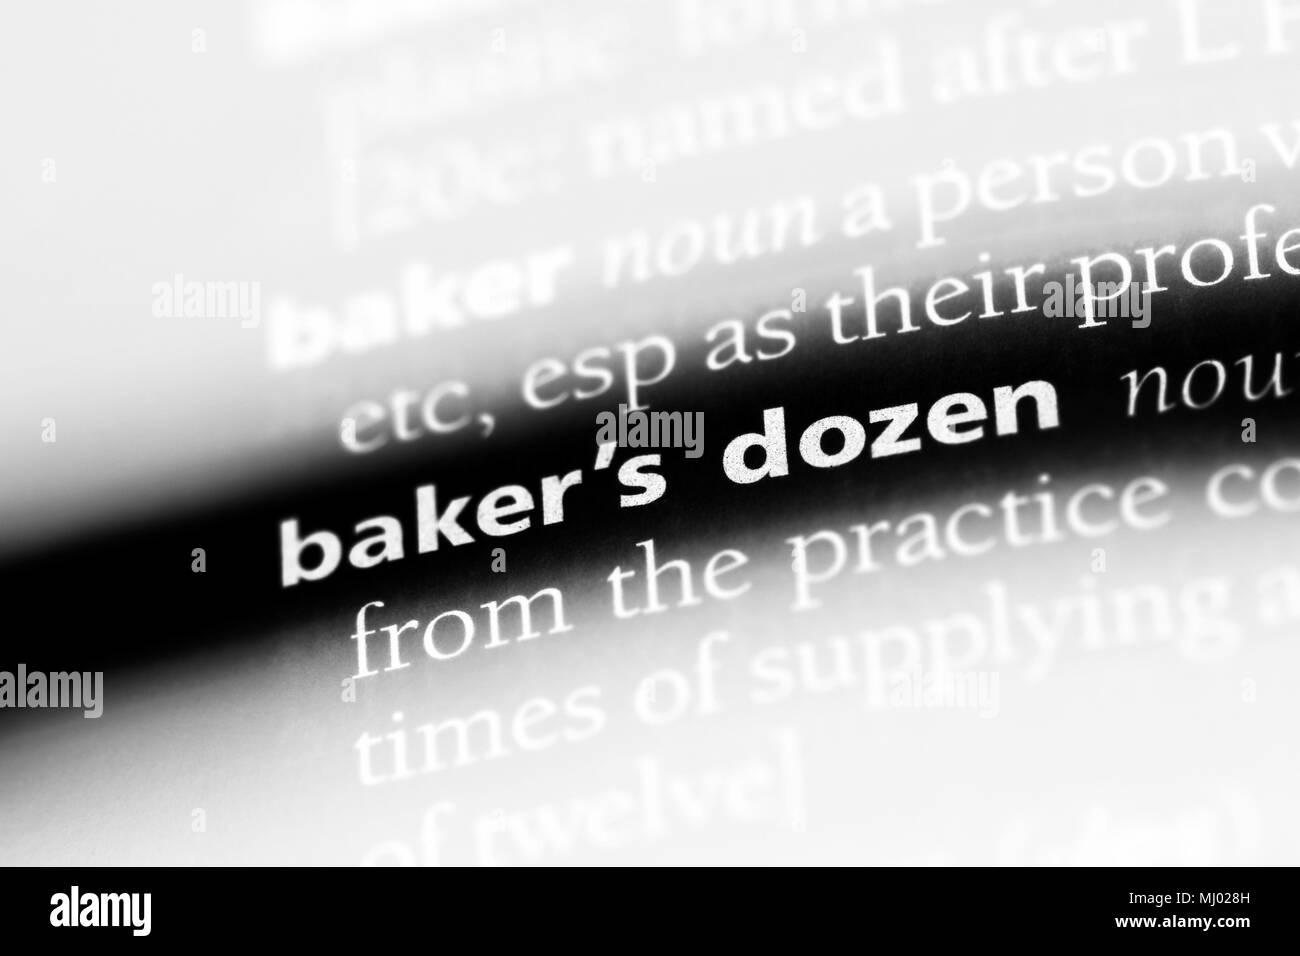 baker's dozen word in a dictionary. baker's dozen concept.